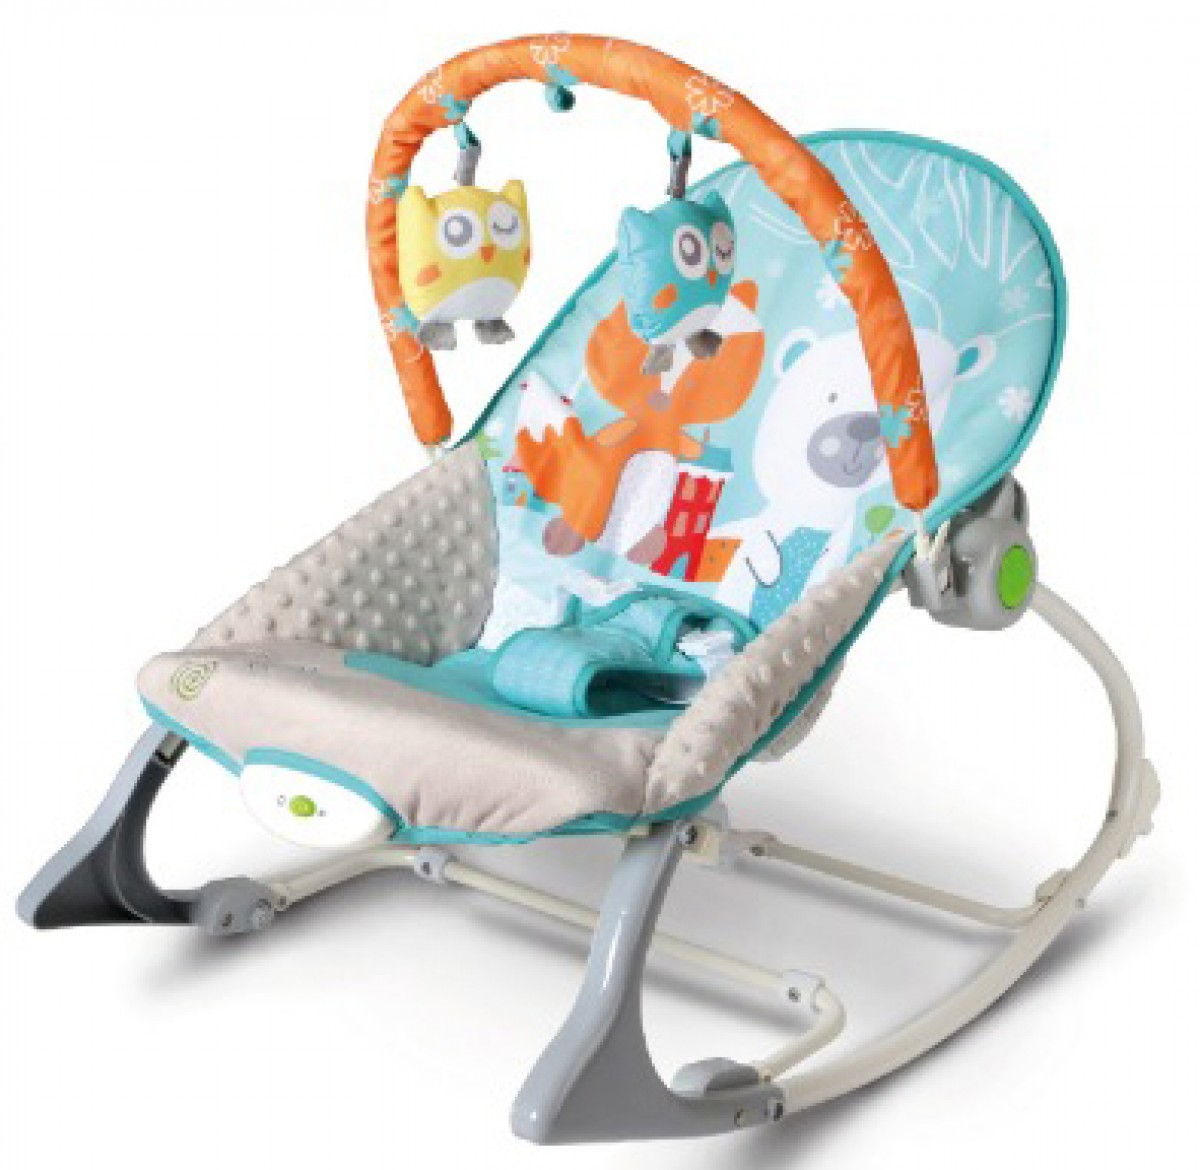 HUGGIE BOUNCER - Kico Baby Center